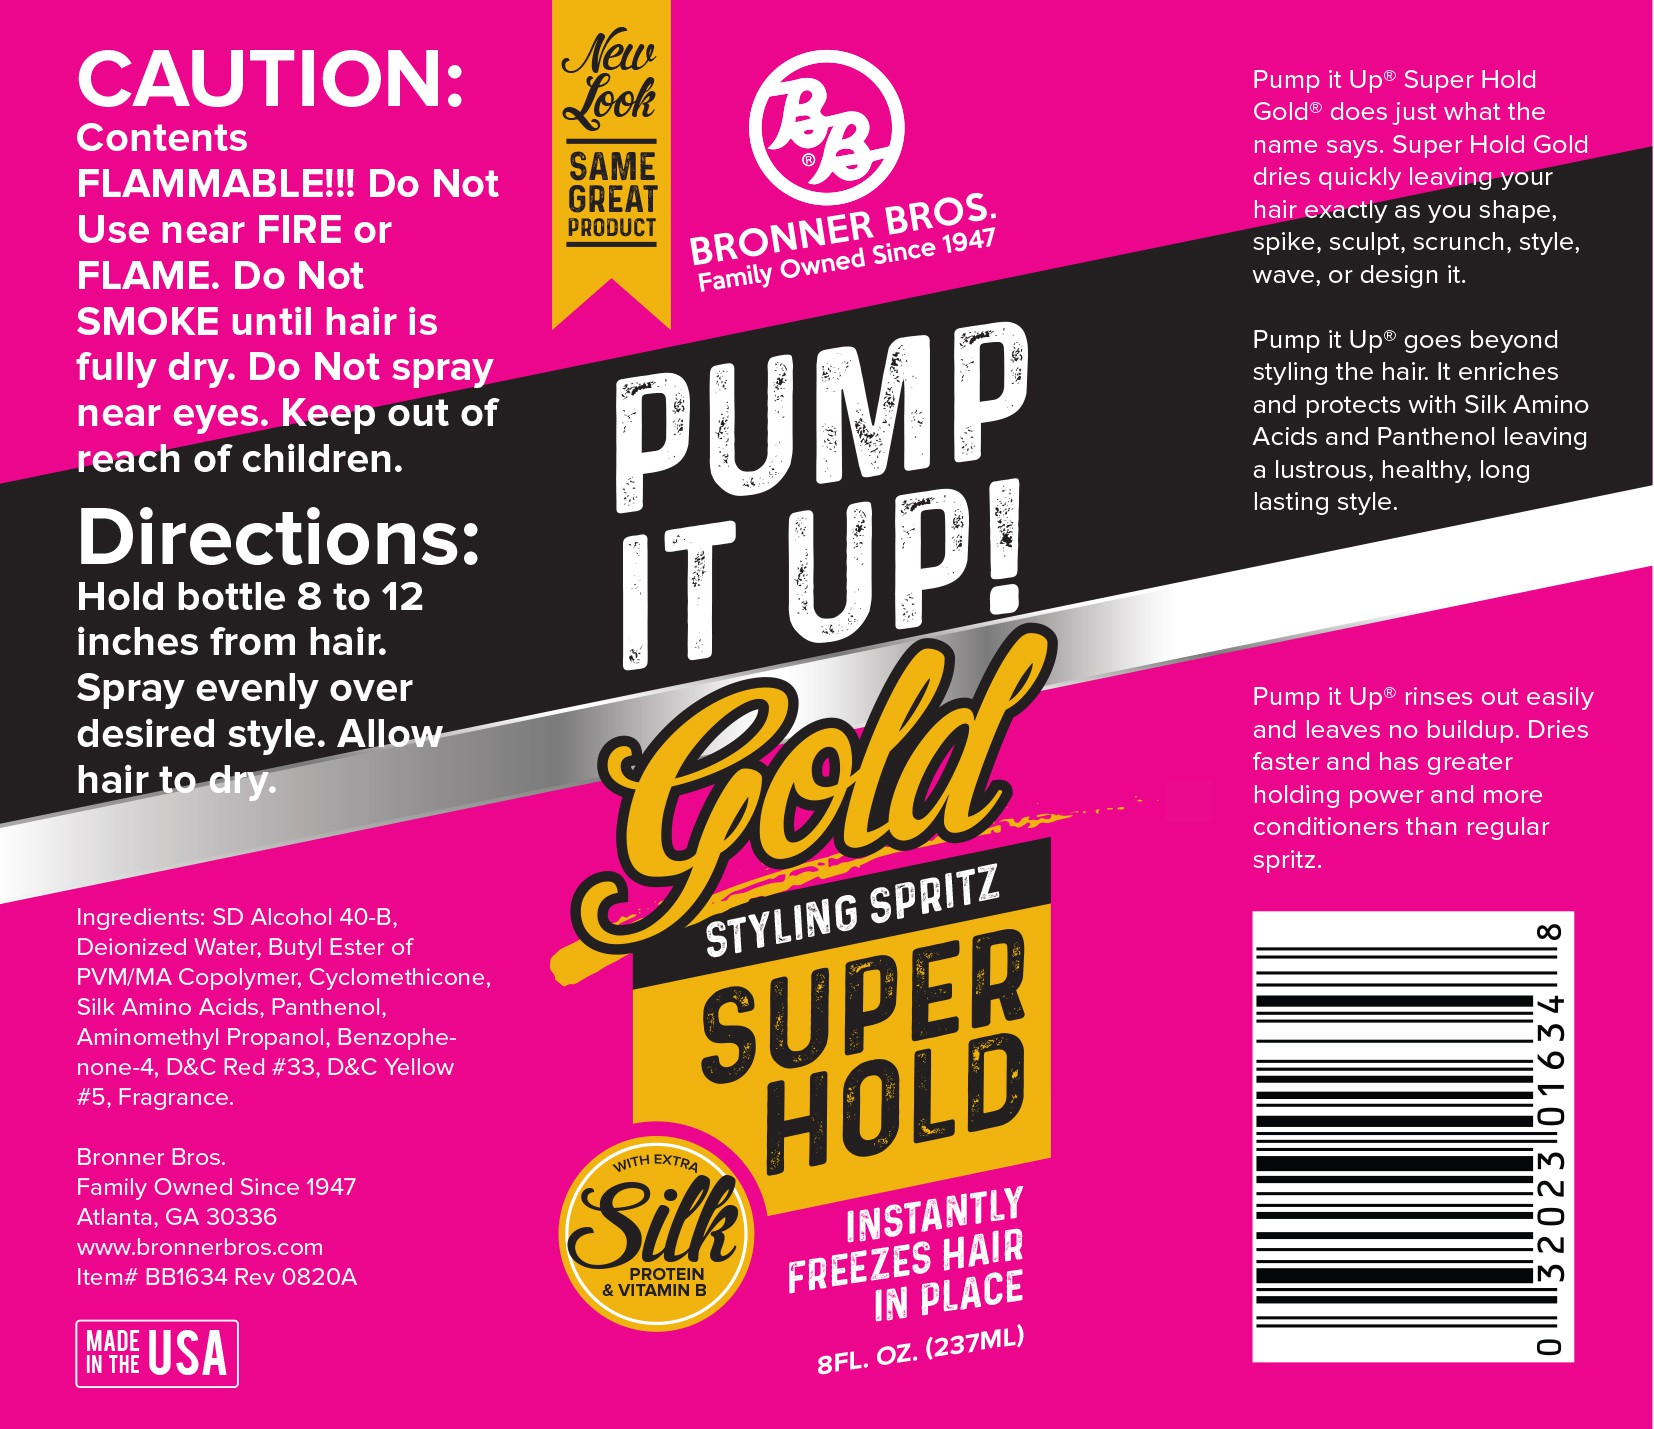 Pump it Up label needs a new look